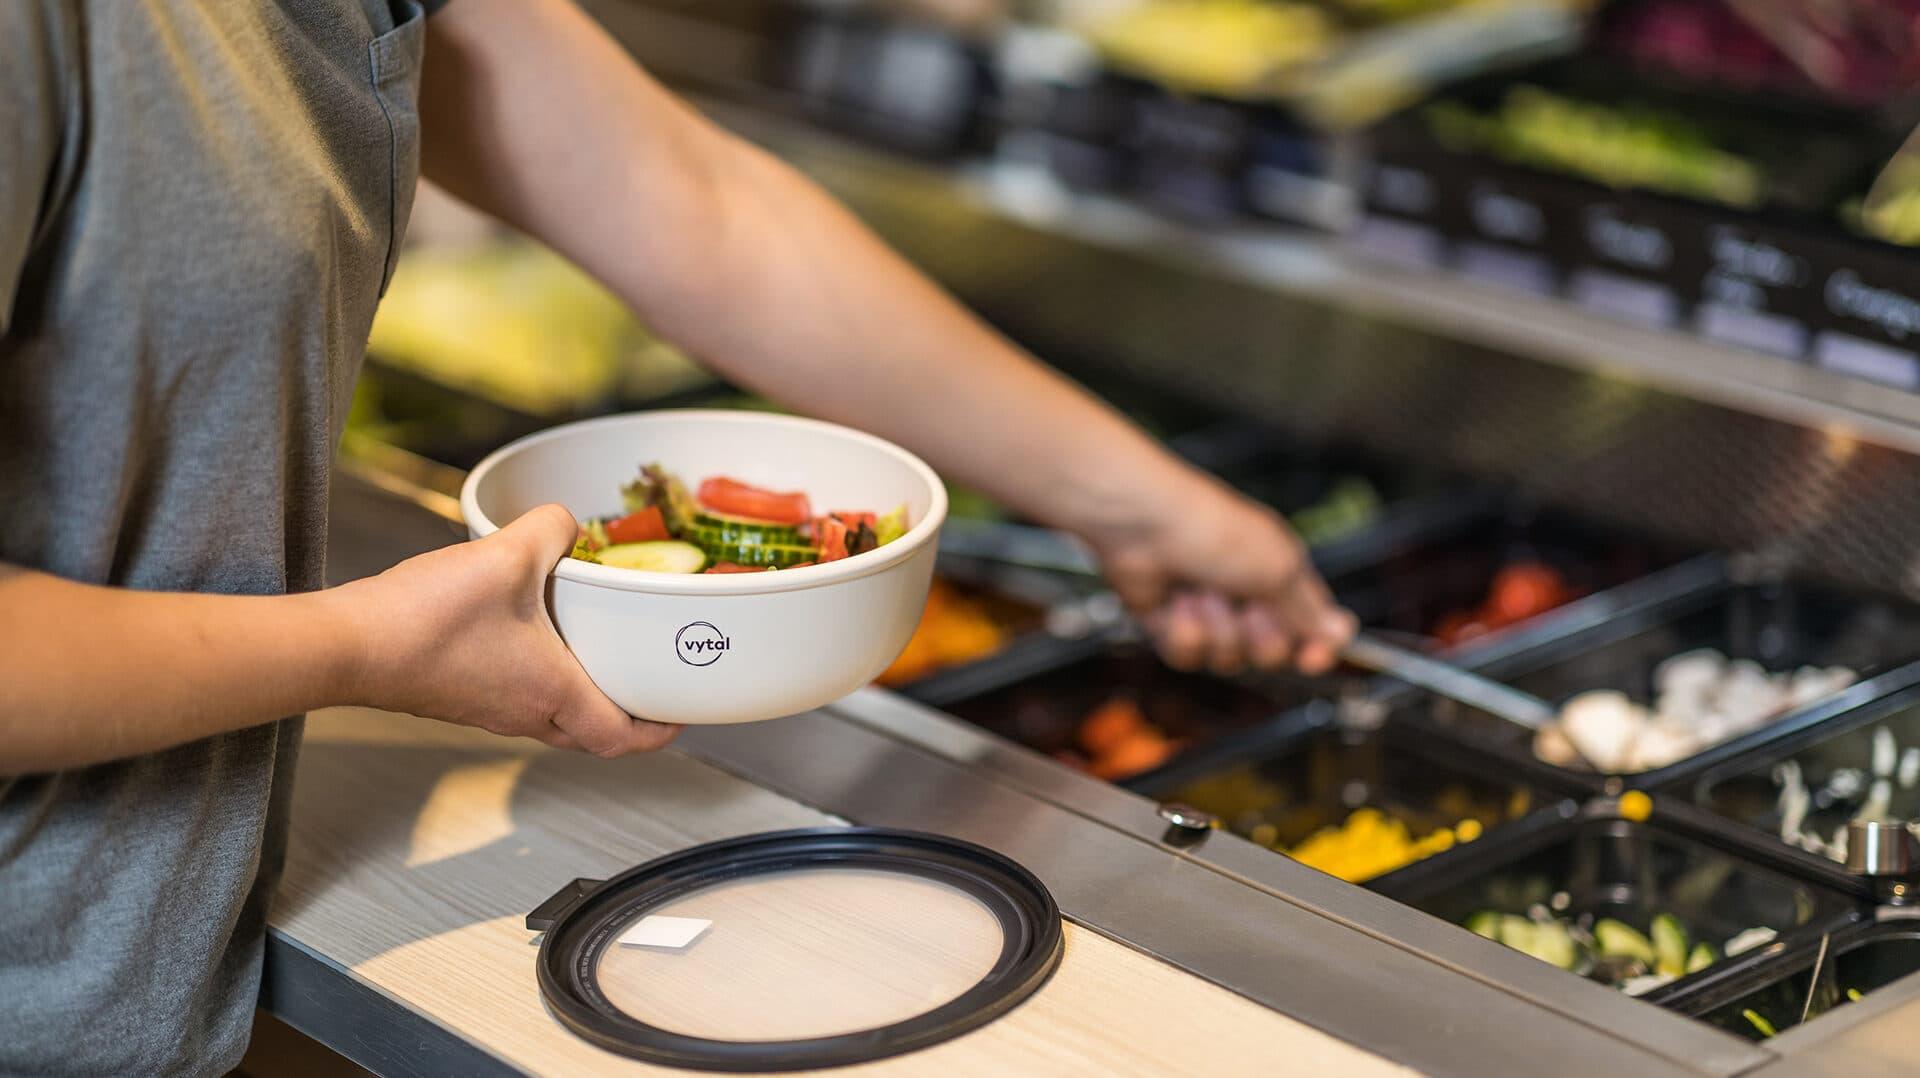 VYTAL Mehrwegkonzept bei REWE Salatbars